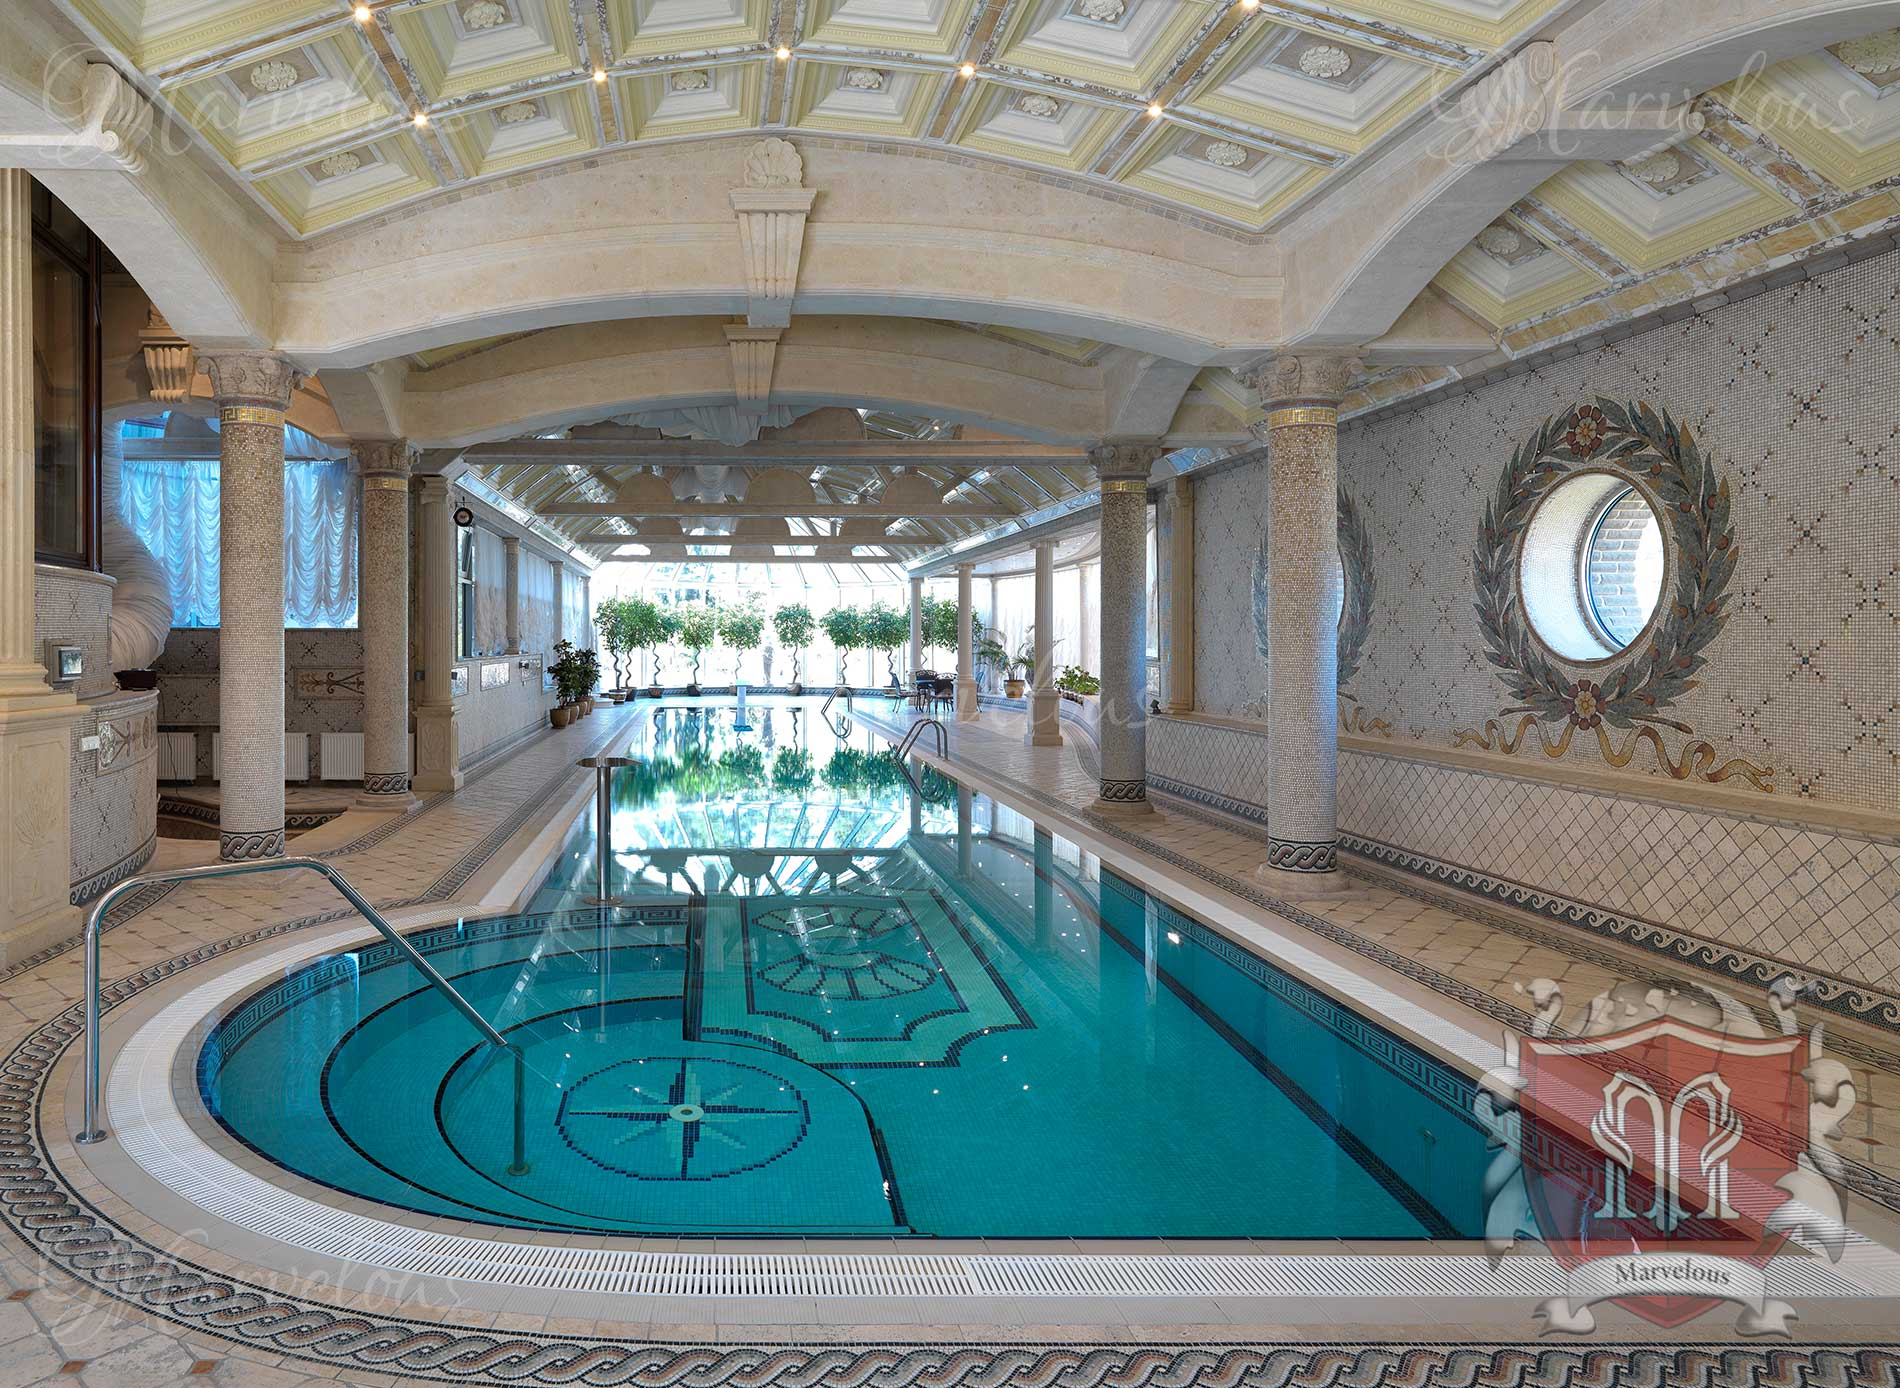 Marble Pool Mosaic: Sirena